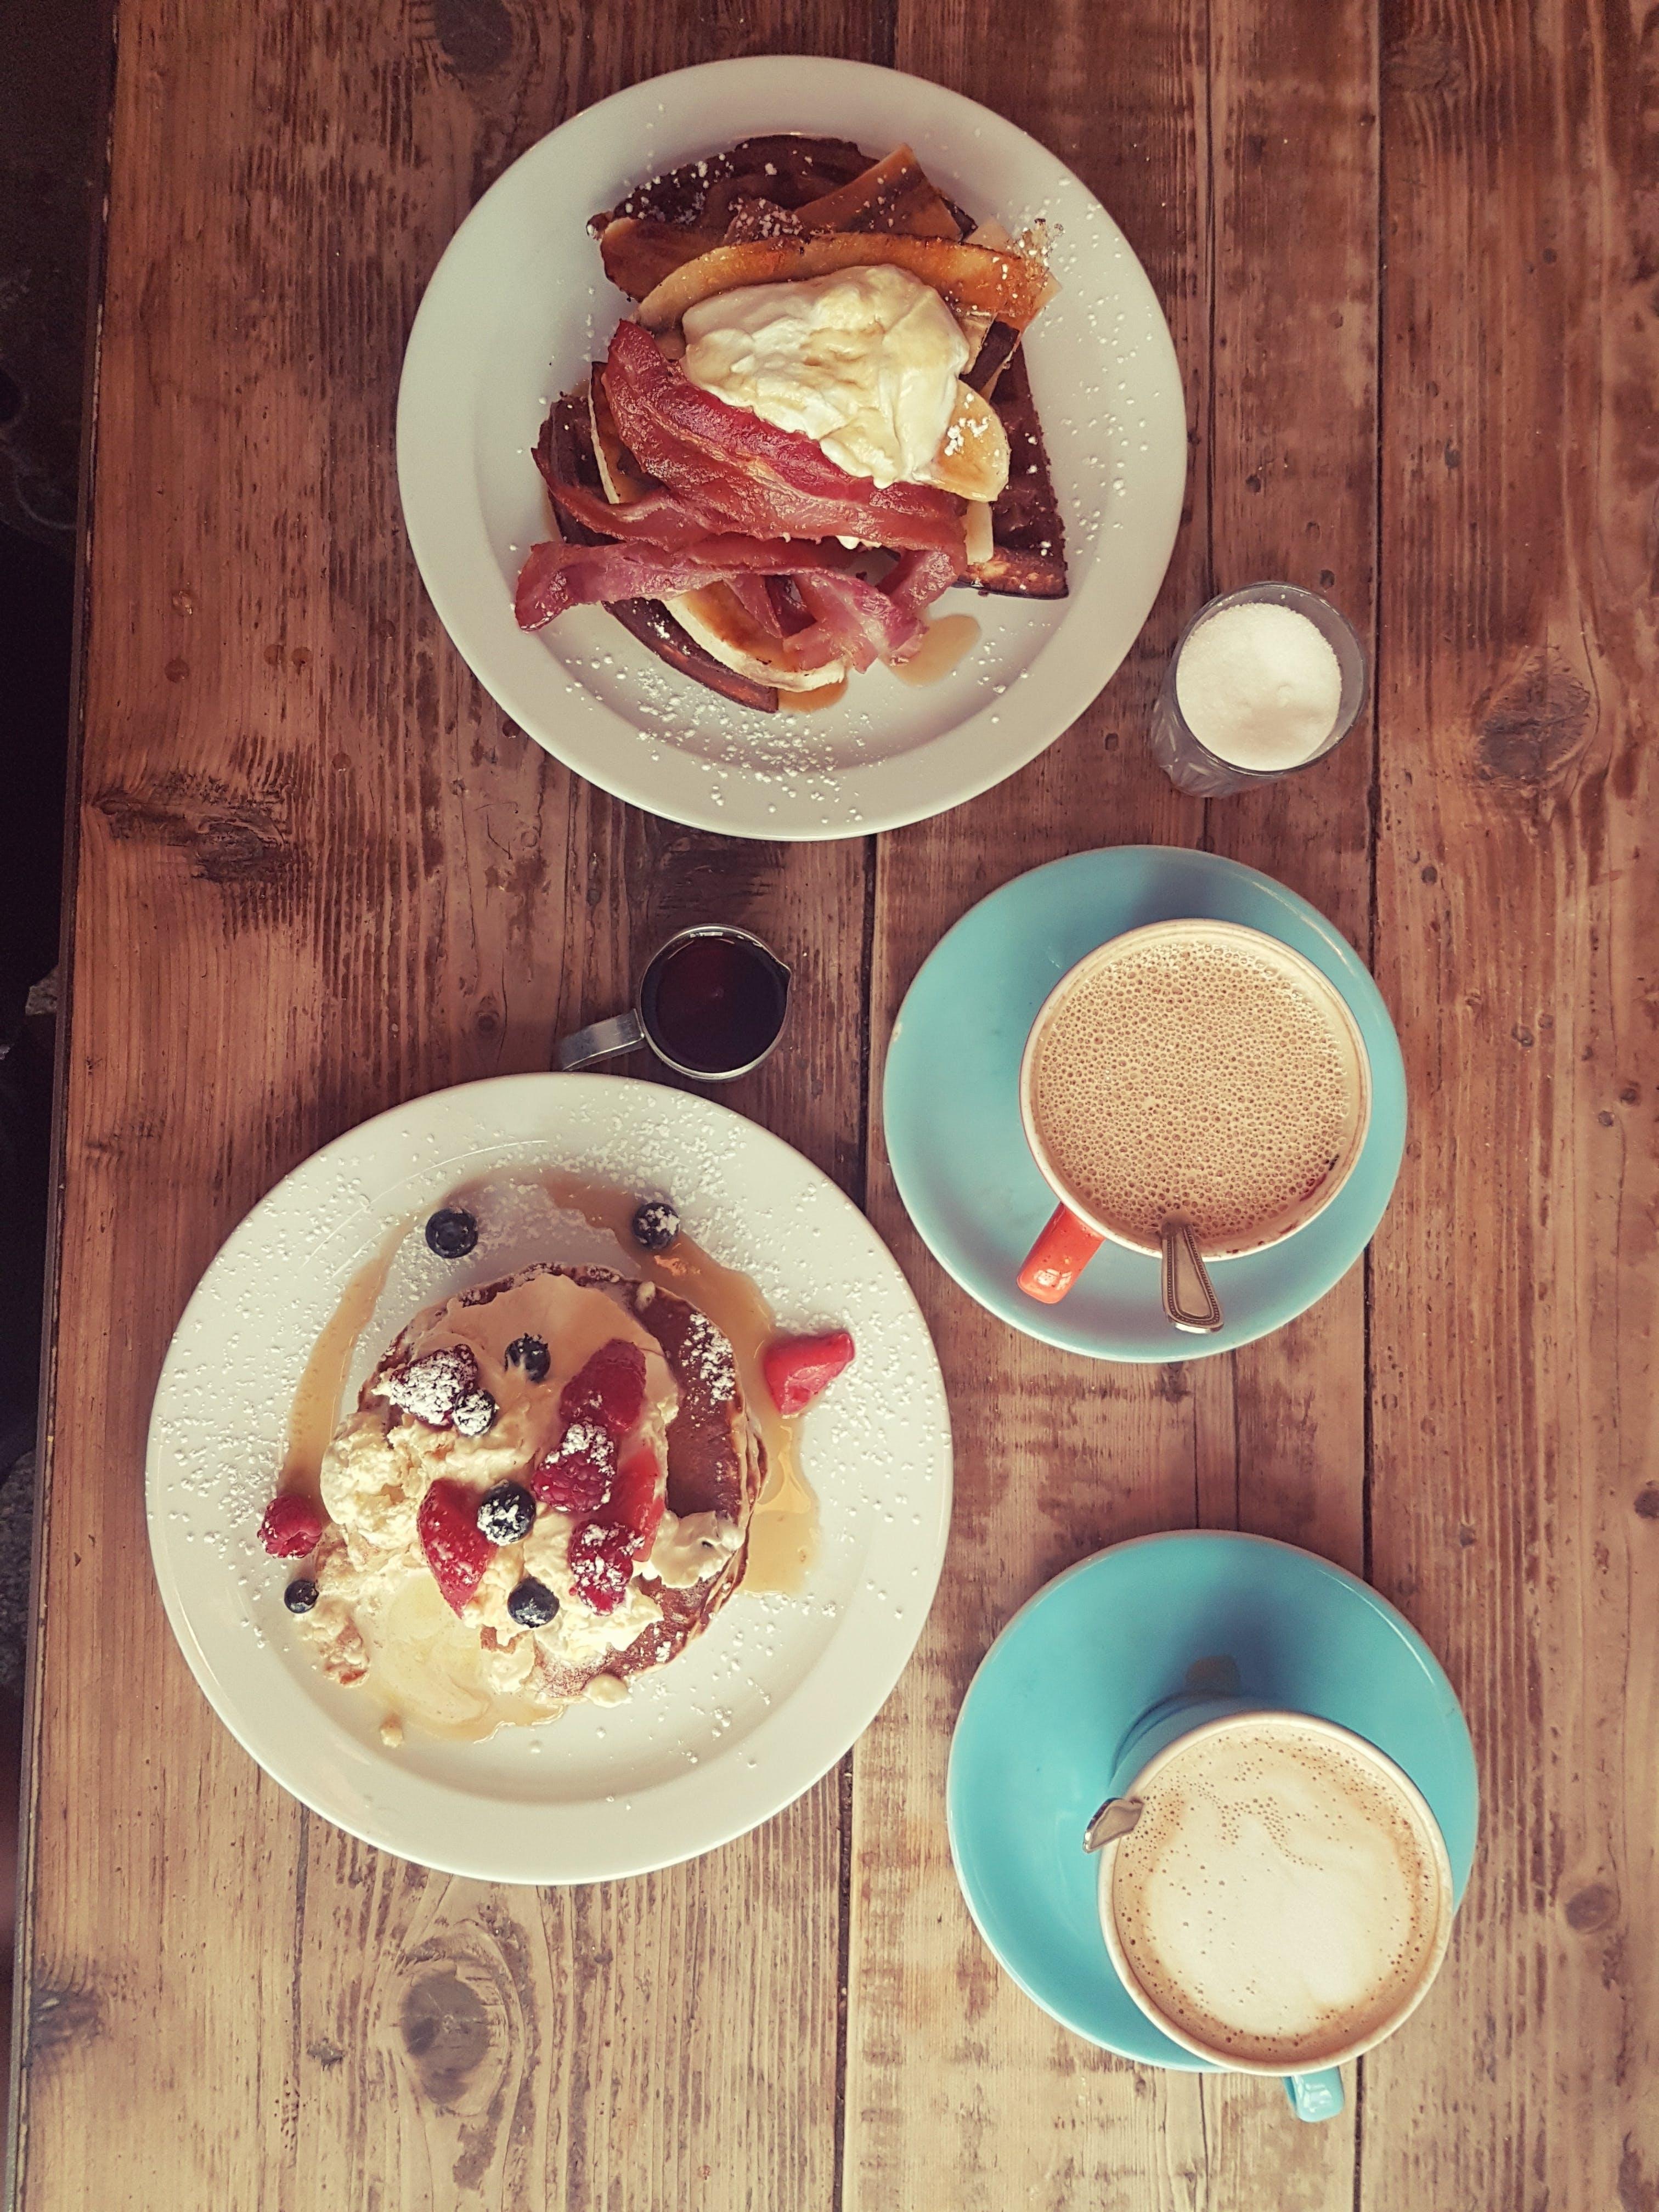 Free stock photo of pancakes, waffles, waffles and pancakes